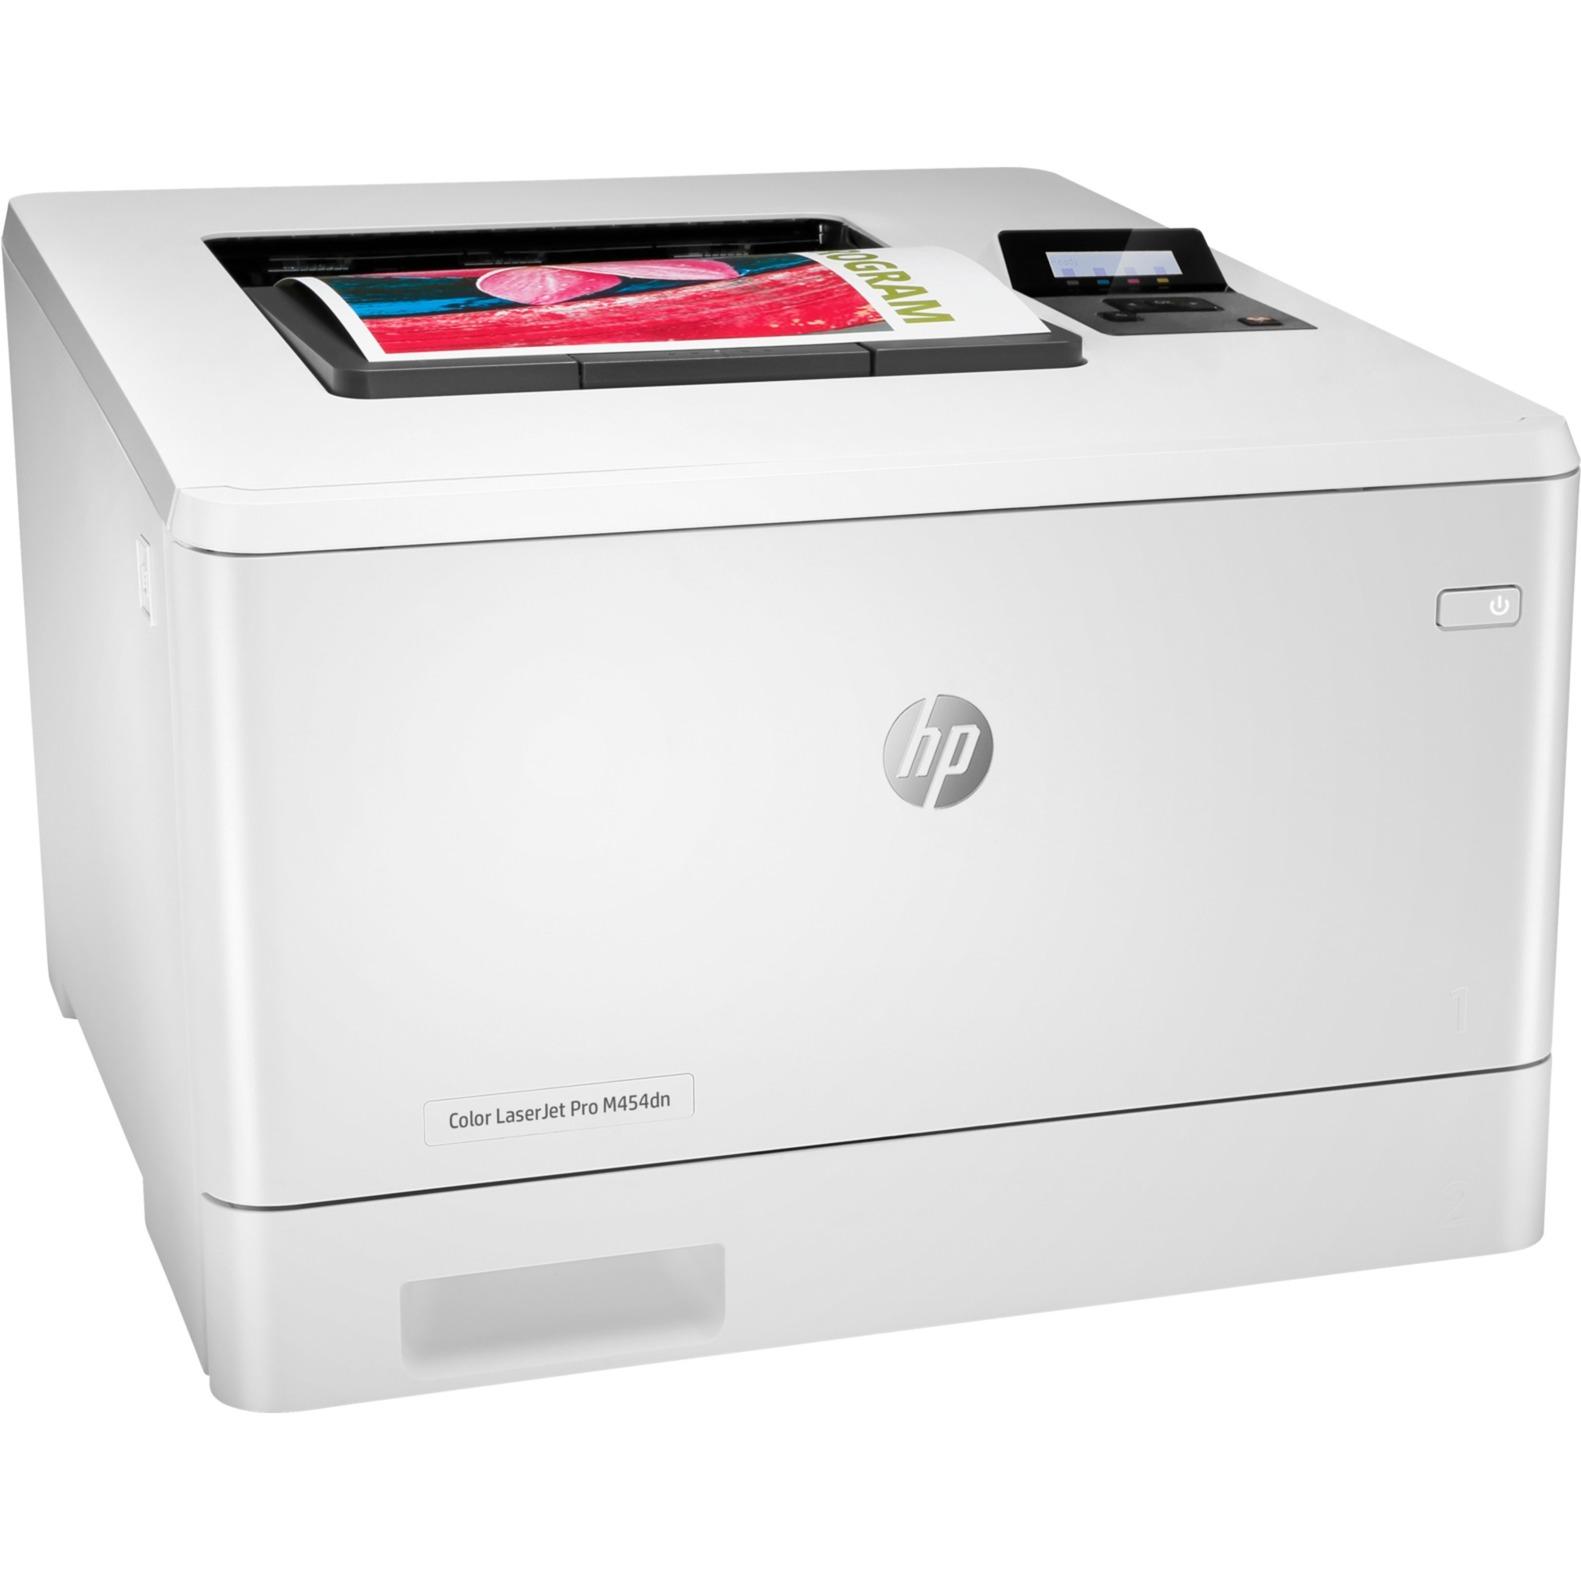 Color LaserJet Pro M454dn 600 x 600 DPI A4, Impresora láser a color